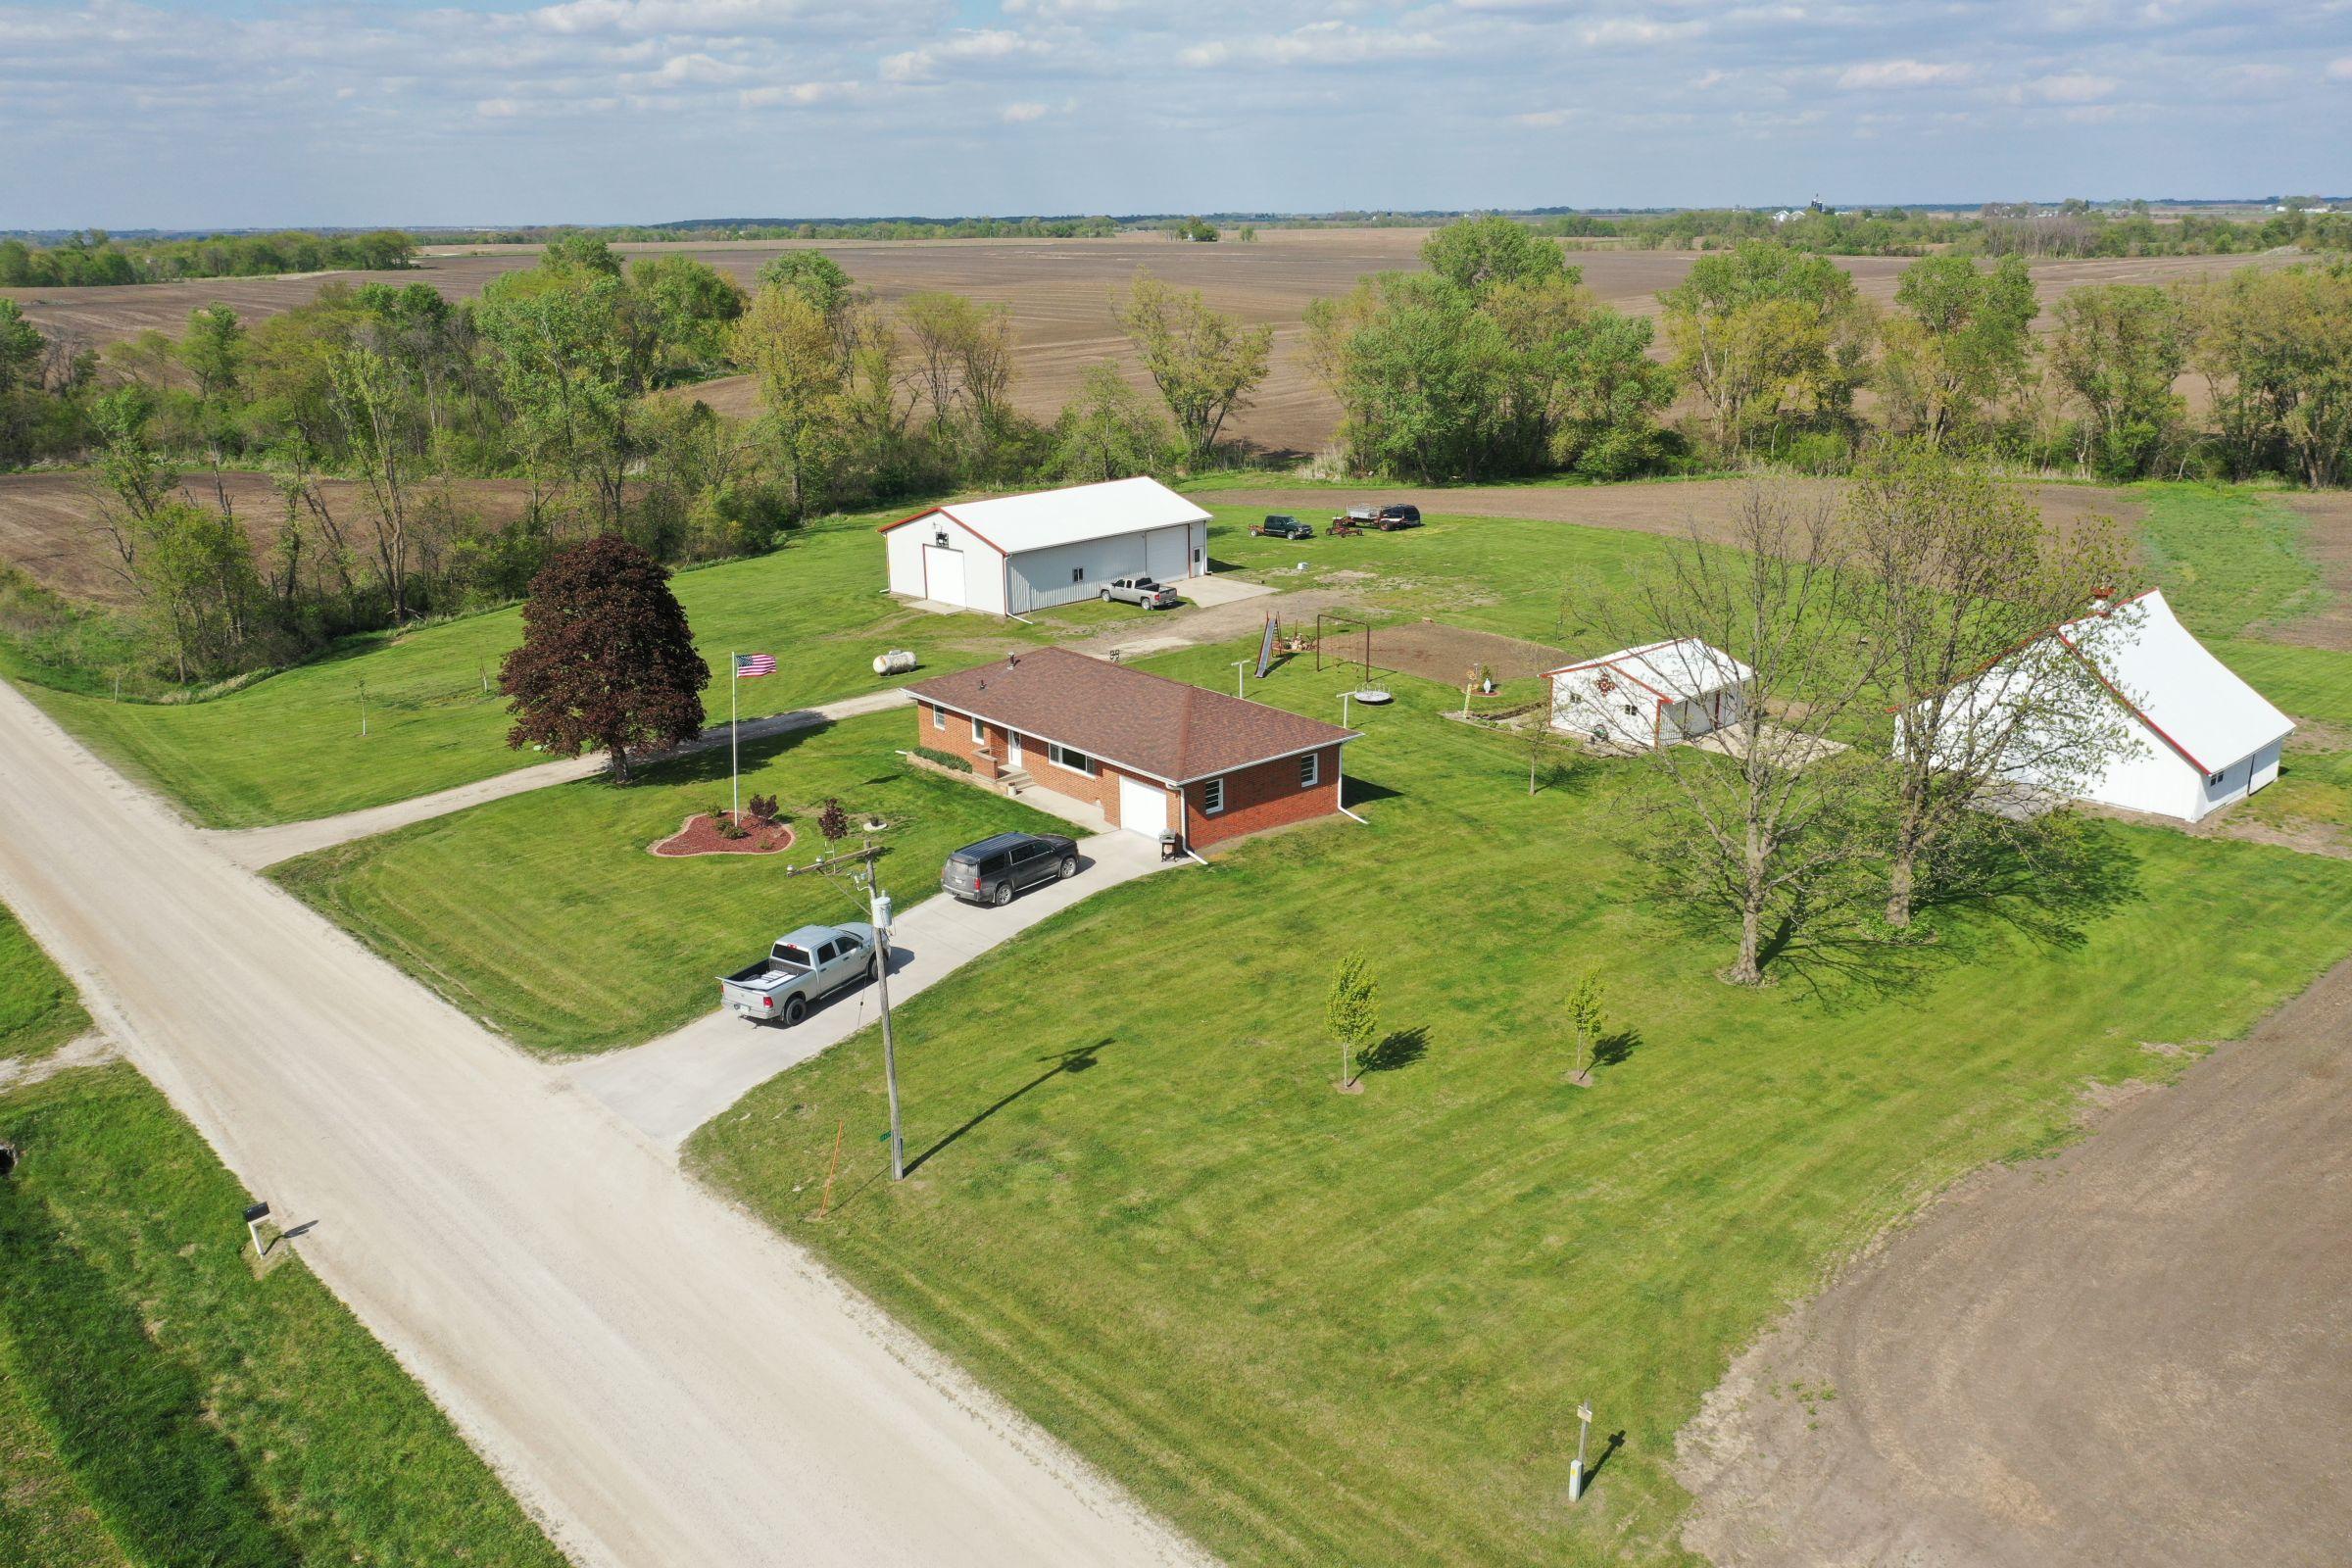 residential-warren-county-iowa-3-acres-listing-number-15516-1-2021-05-11-163715.JPG